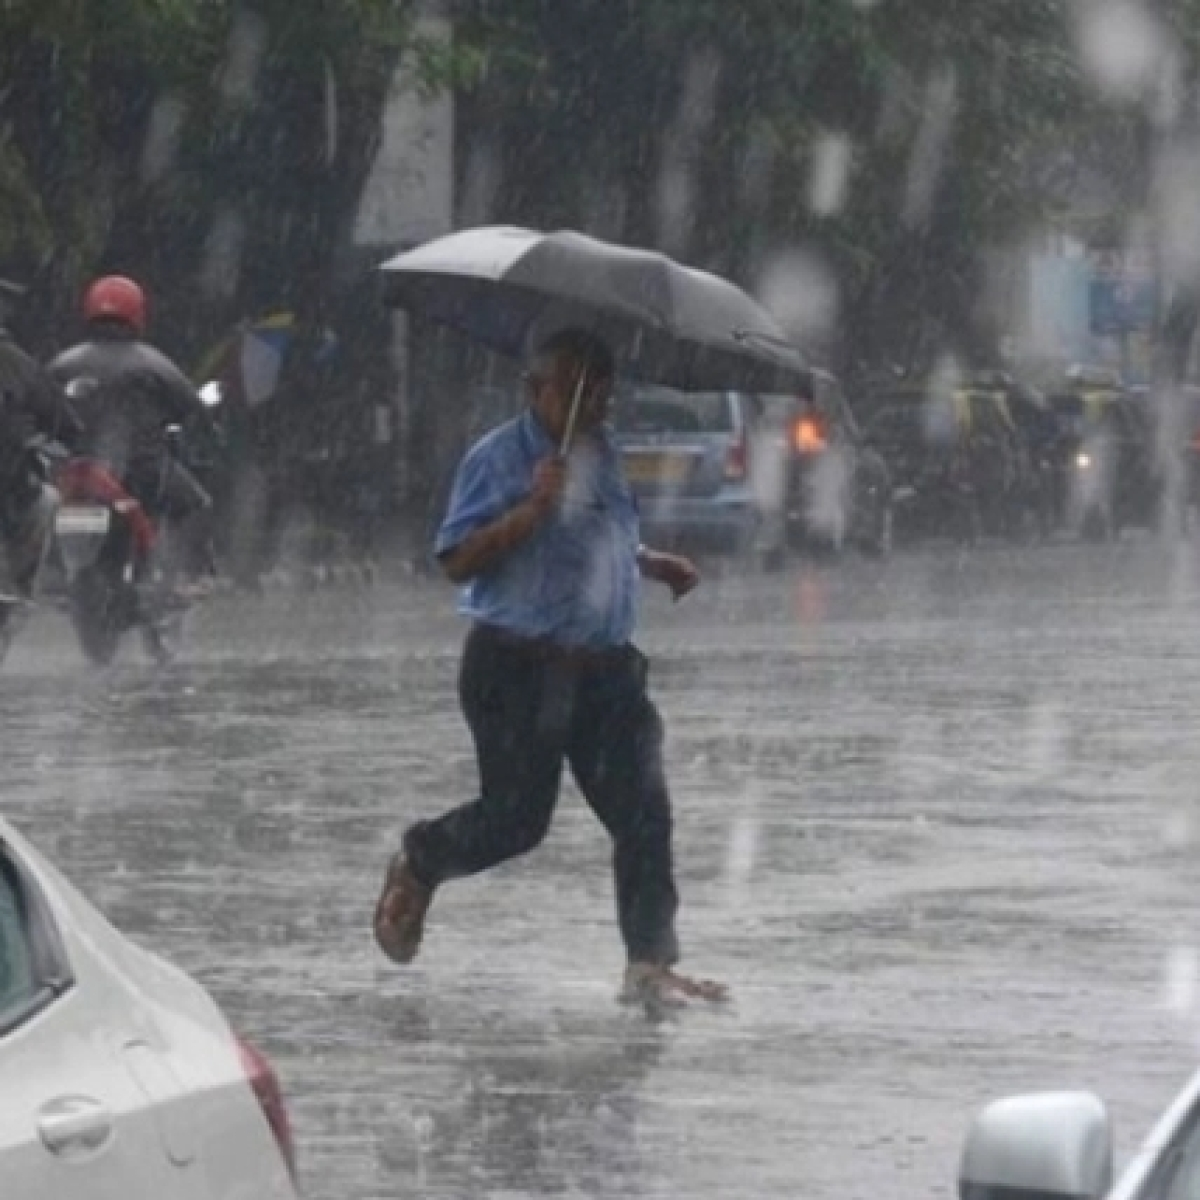 Mumbai, Thane and Navi Mumbai Weather Update: Rains to continue today, predicts IMD